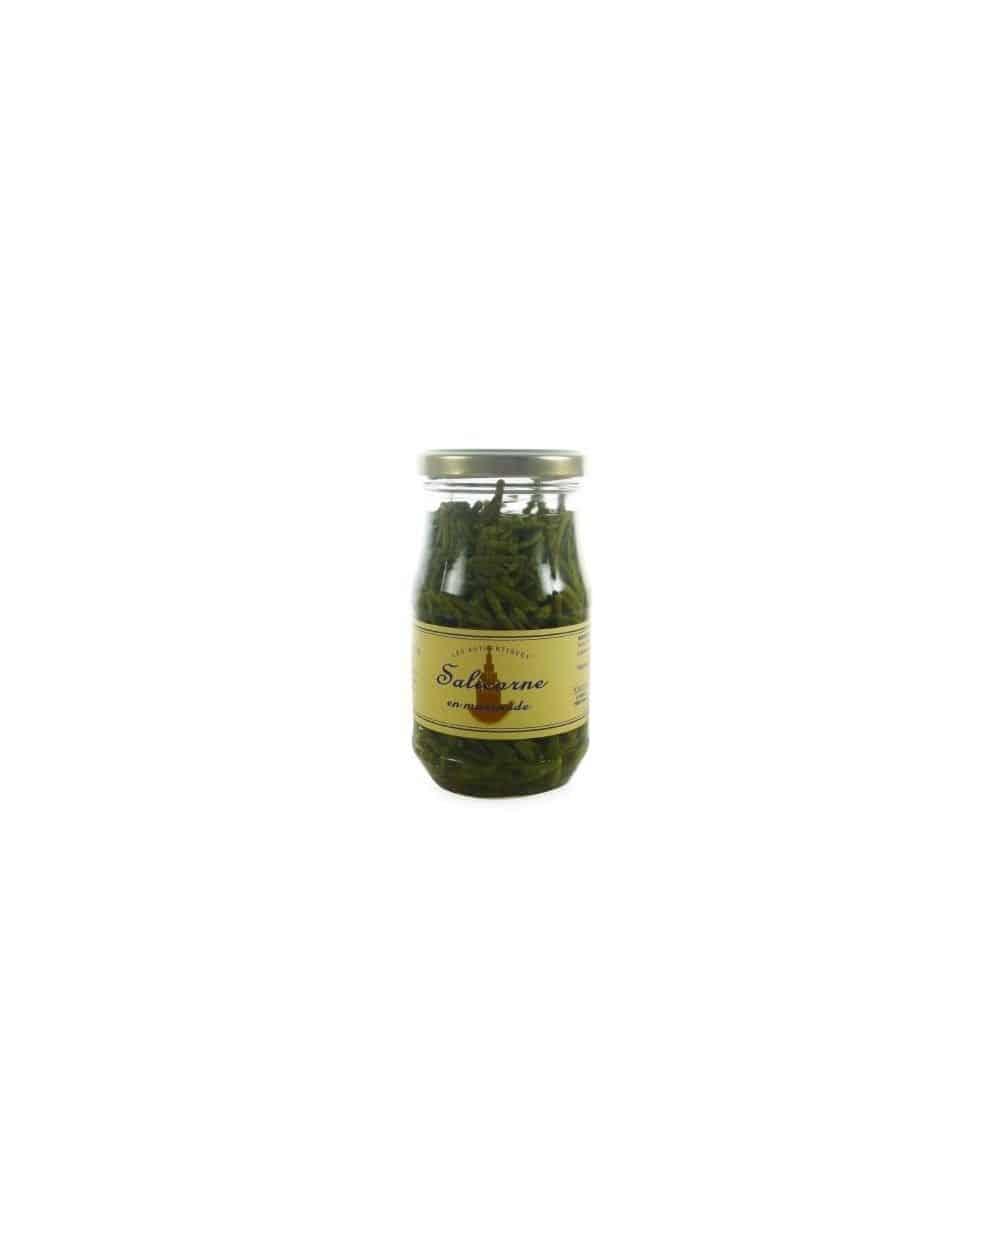 Salicorne au naturel 370ml